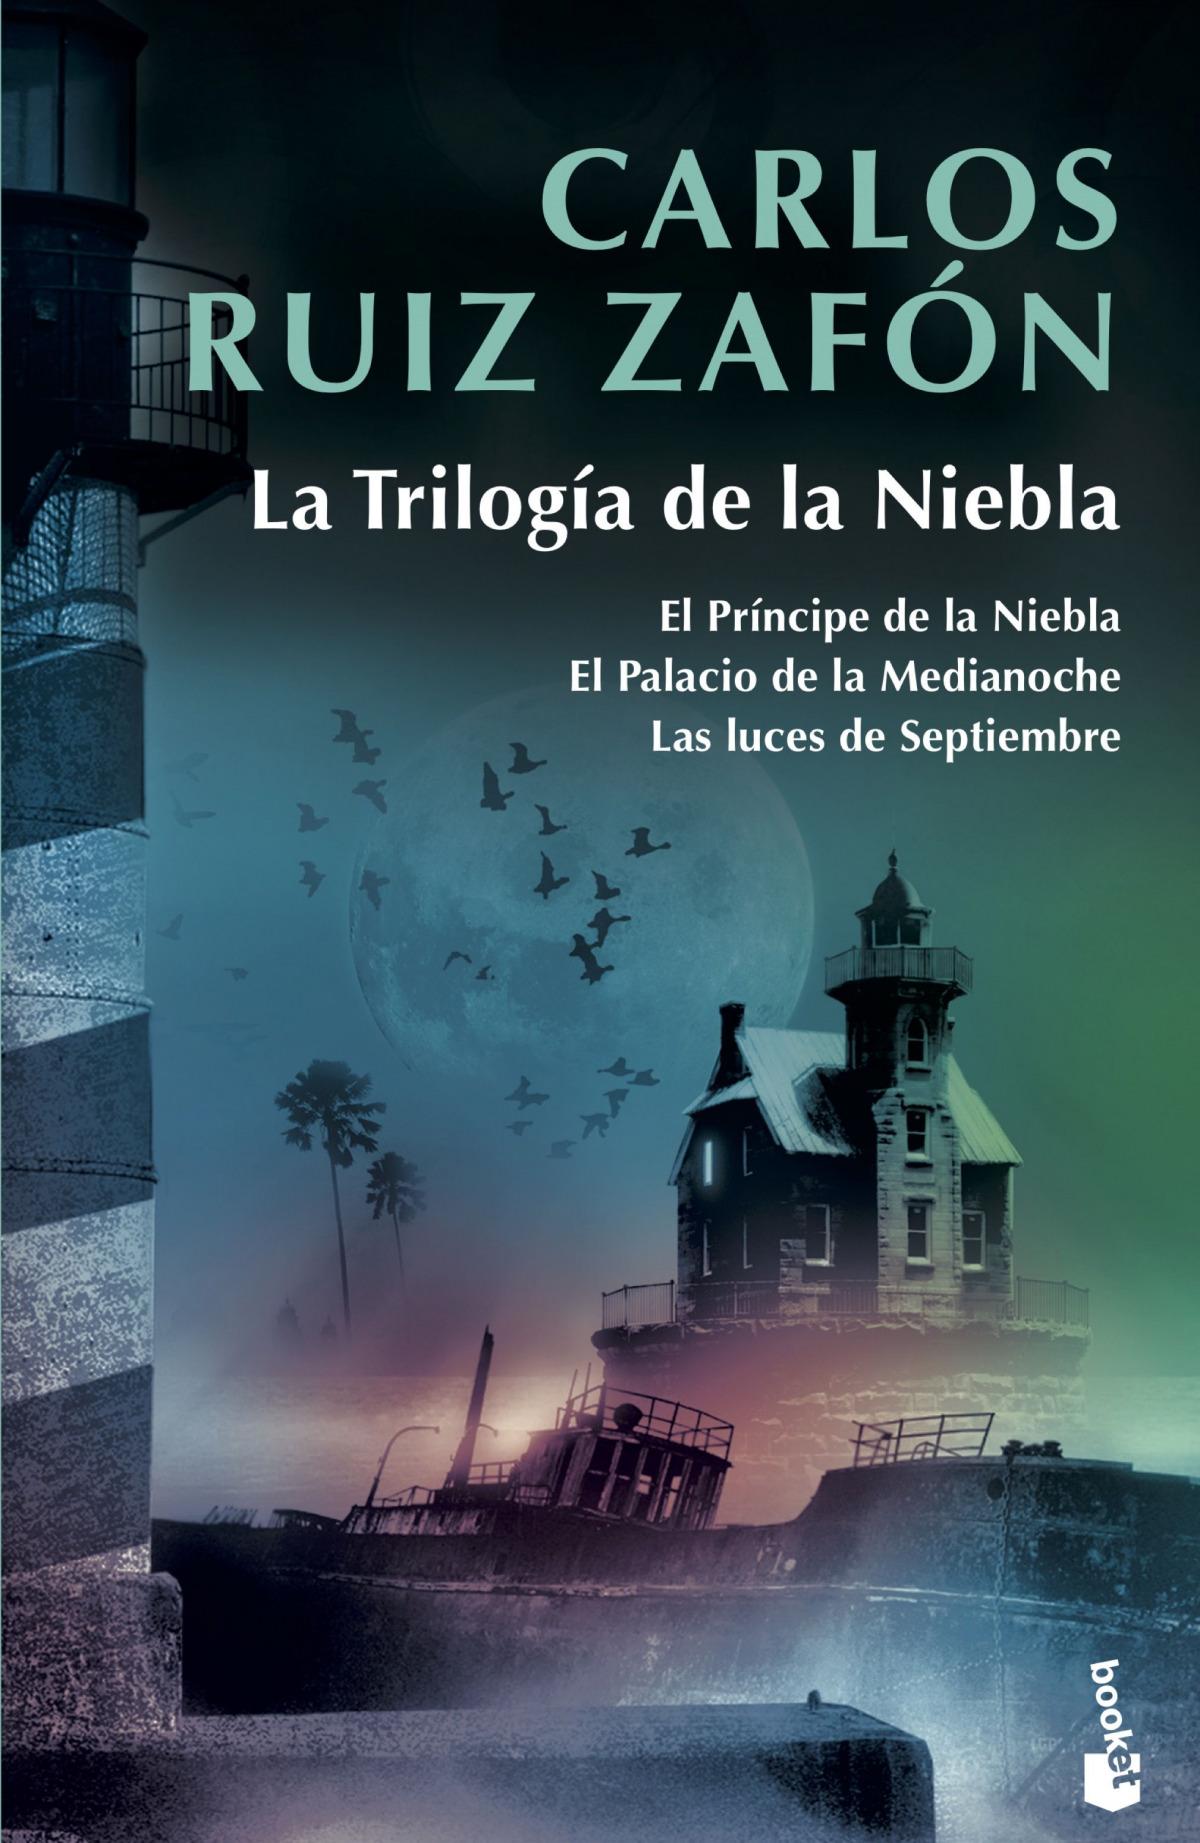 LA TRIOLOGIA DE LA NIEBLA CARLOS RUIZ ZAFON